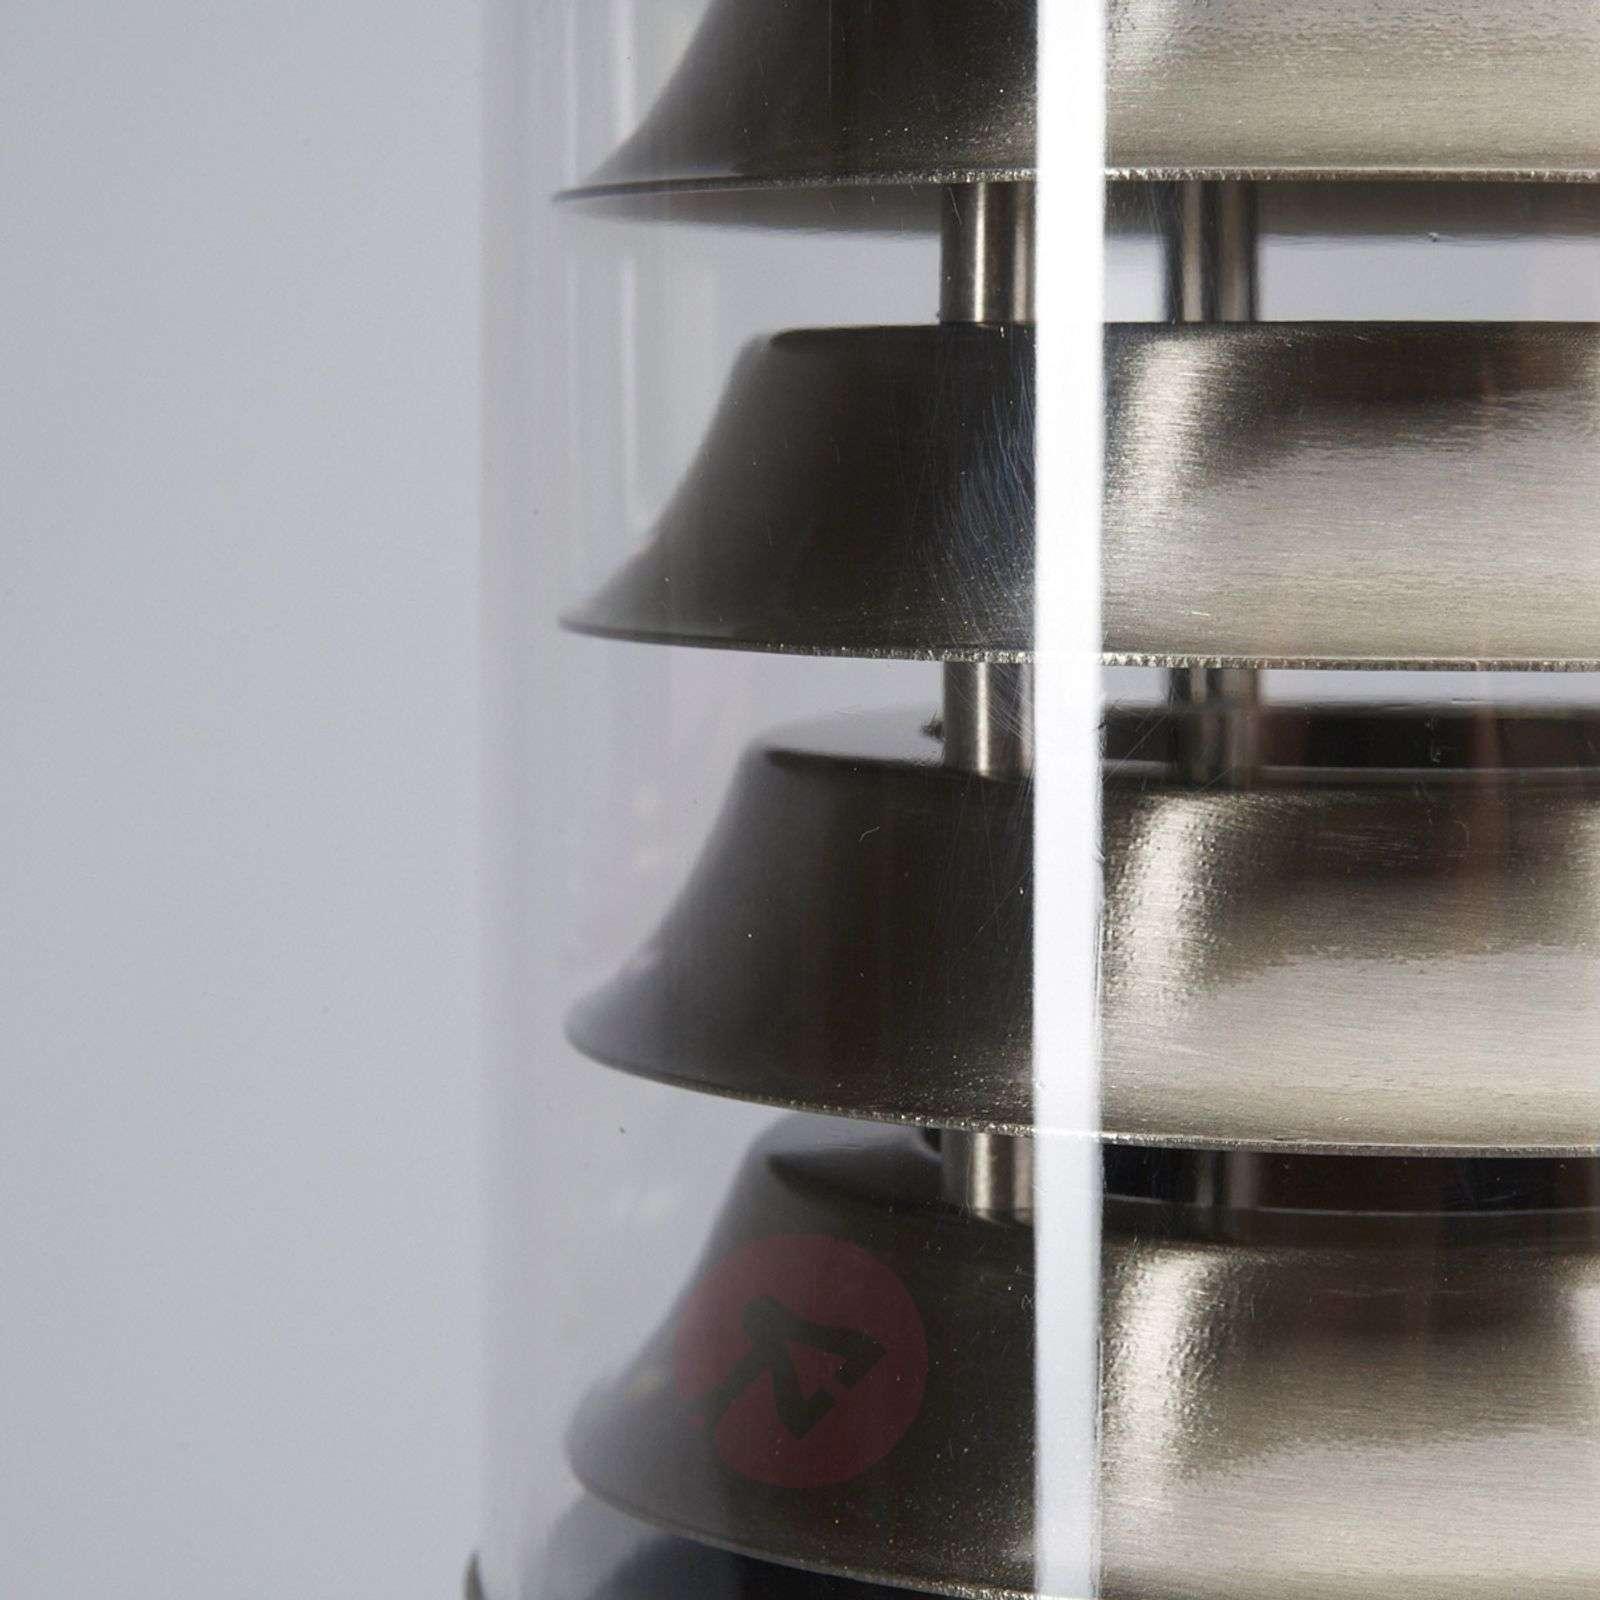 Enja Stainless Steel Pillar Lamp with Fins-9960023-01